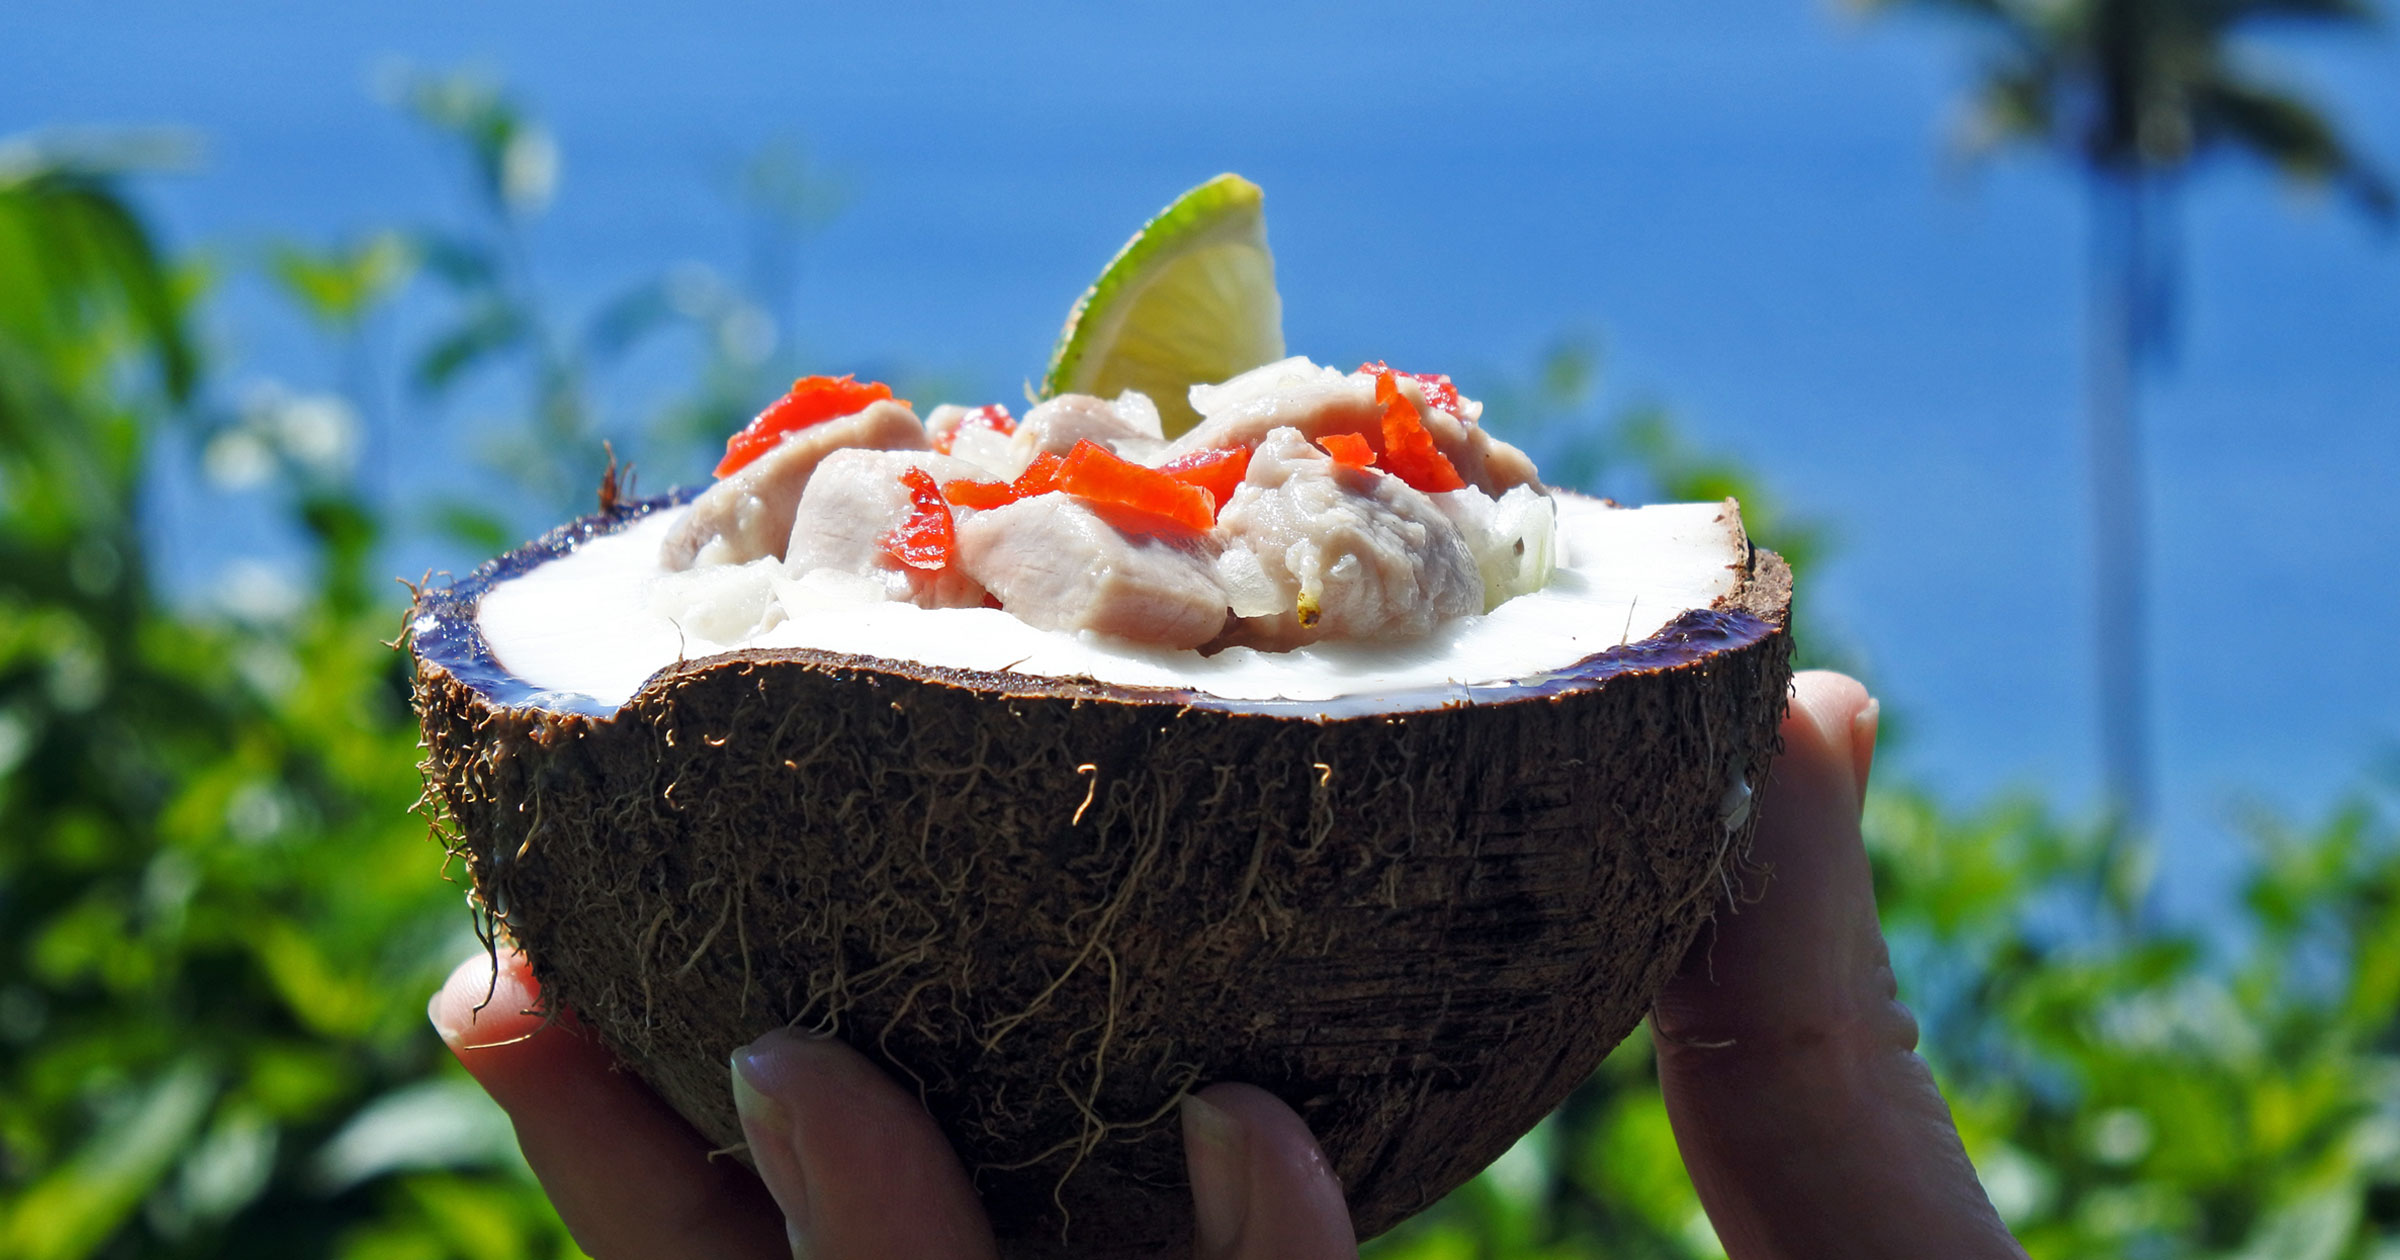 Fijian Coconut Food